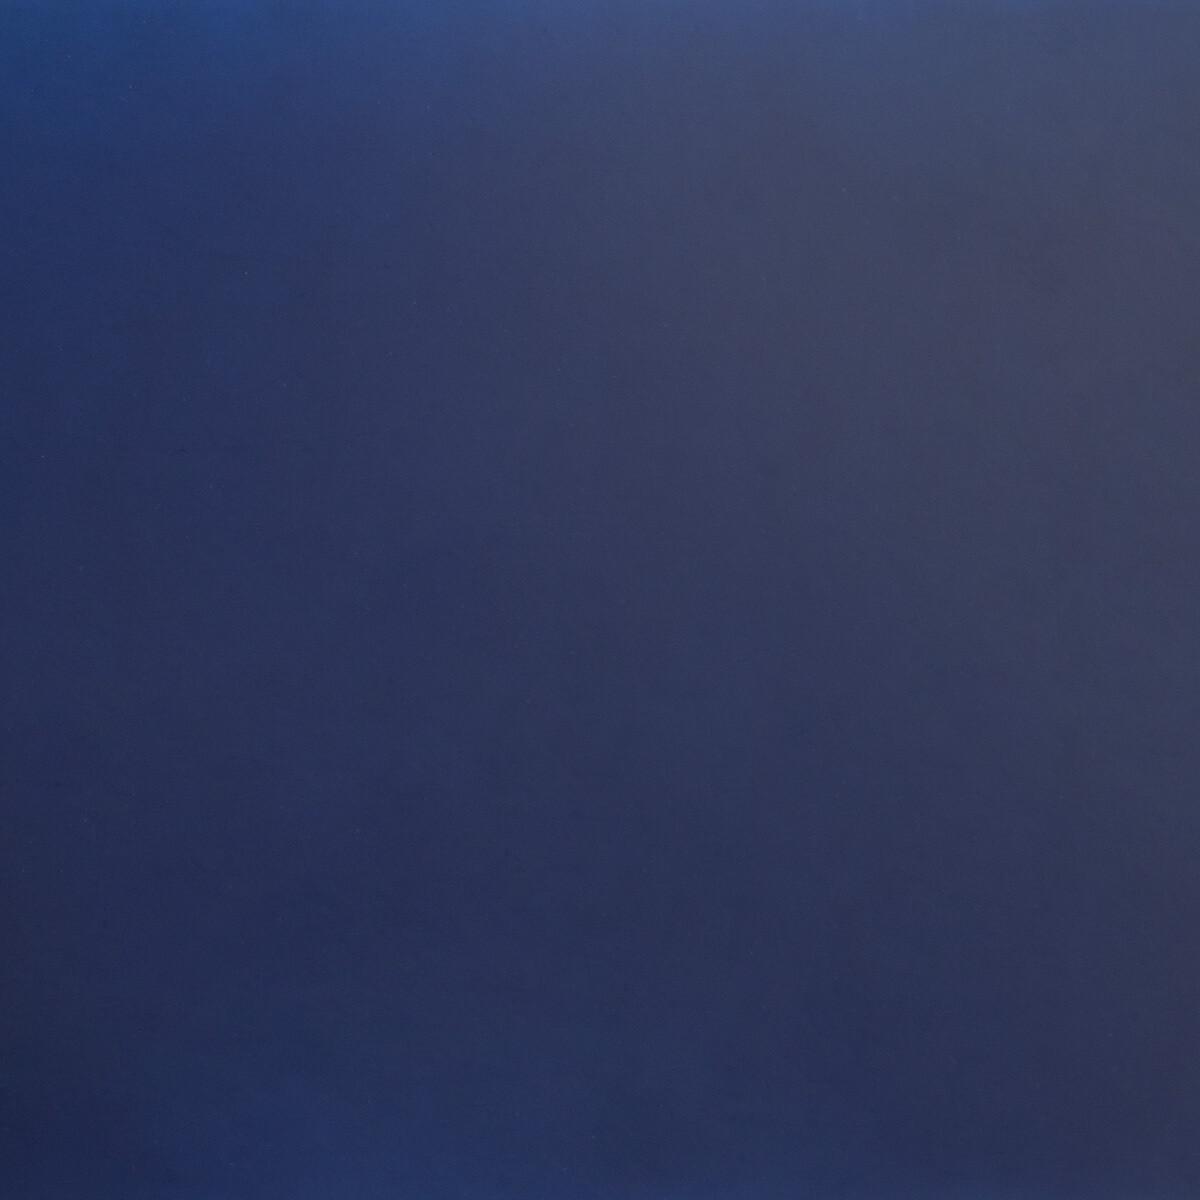 Navy Blue Hotmark Revolution HTV - Large Roll